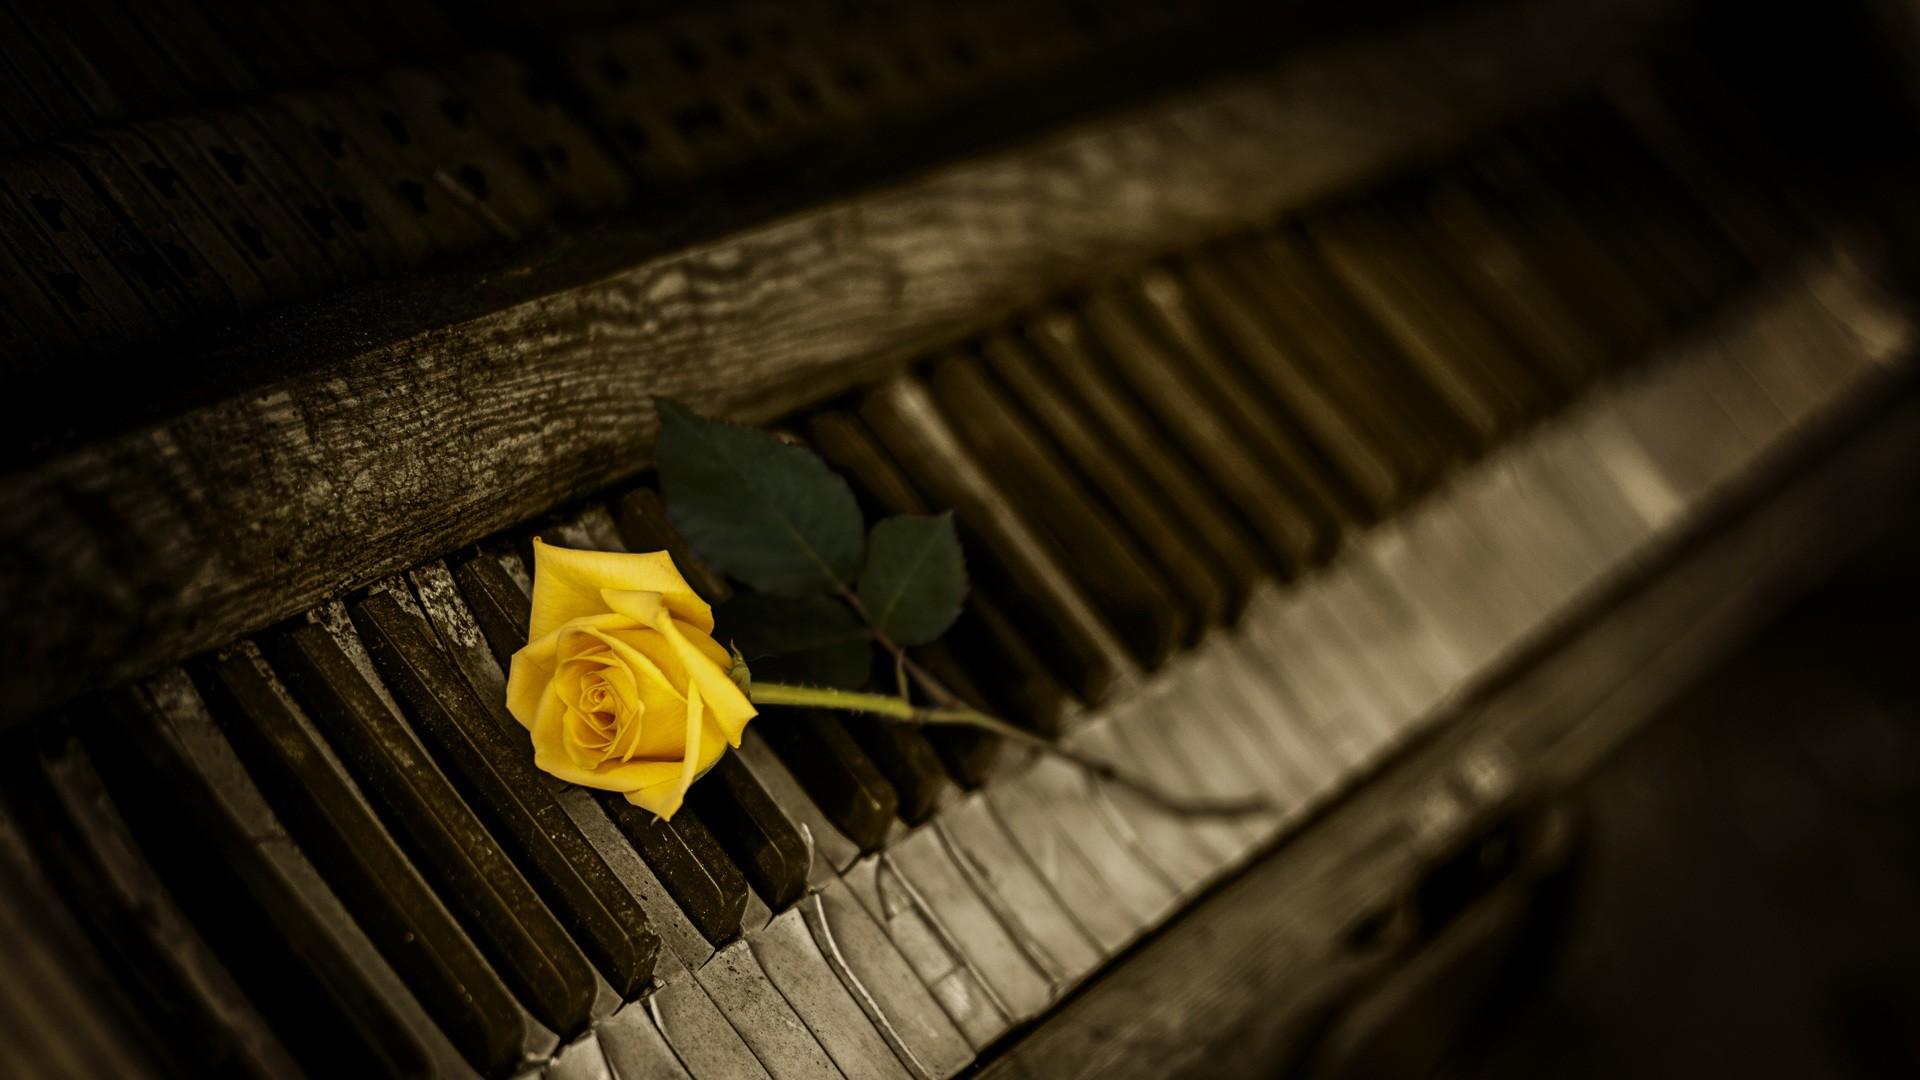 … Background Full HD 1080p. Wallpaper piano, rose, keys